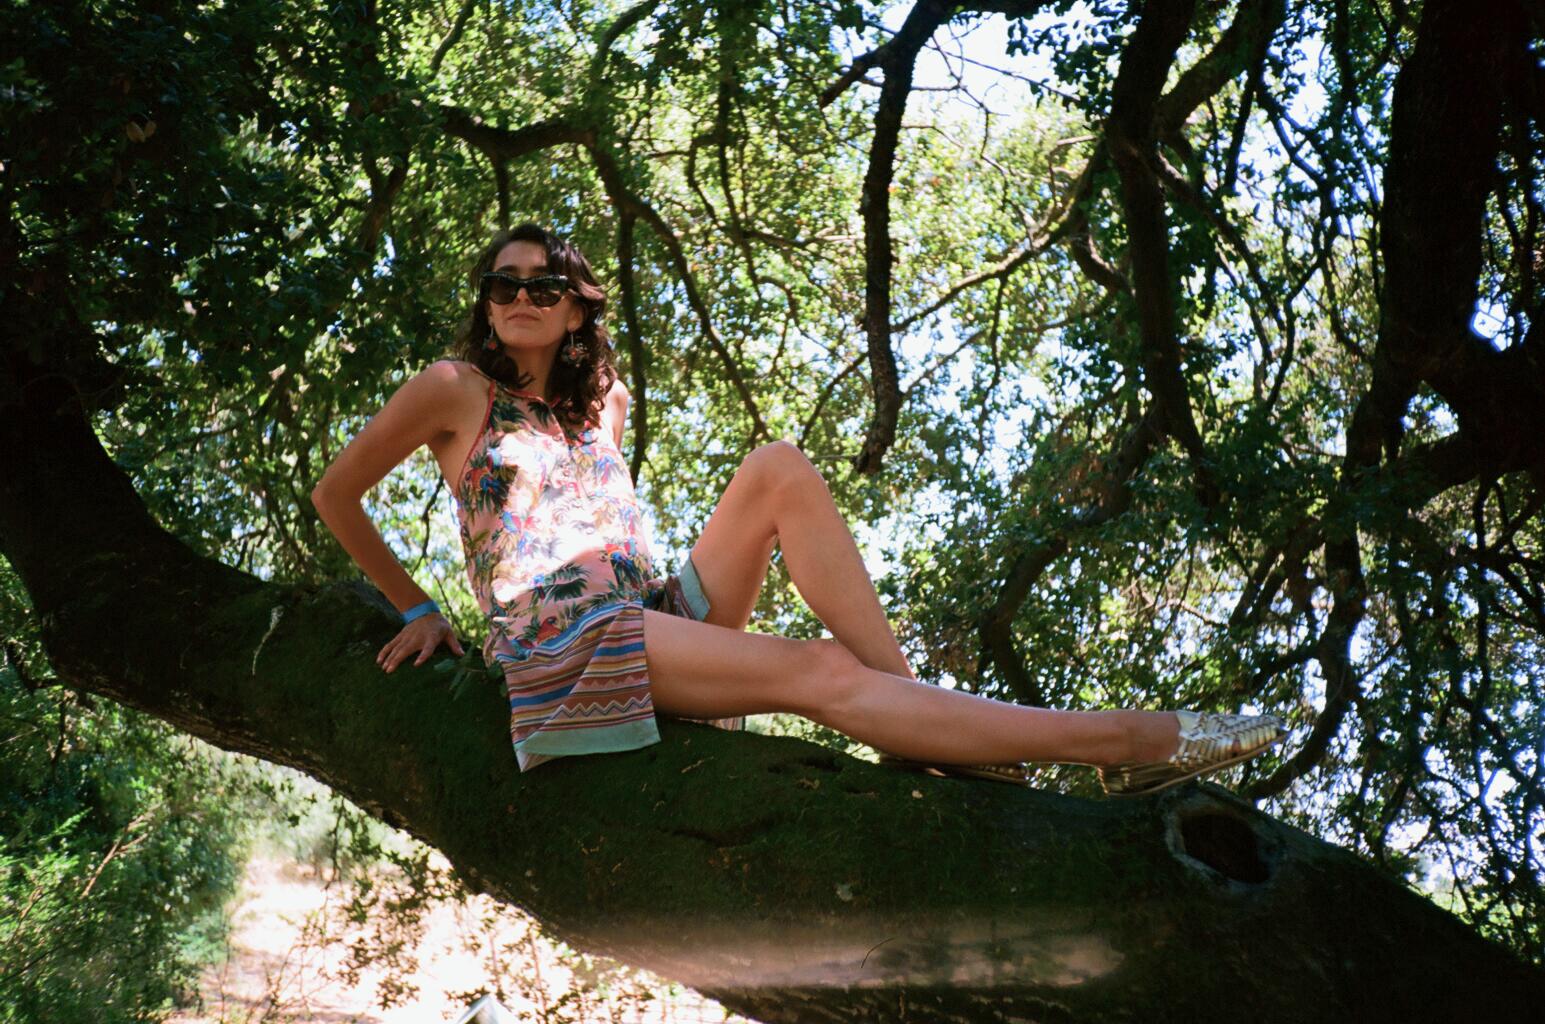 Meg Webb: Sunburn Chic